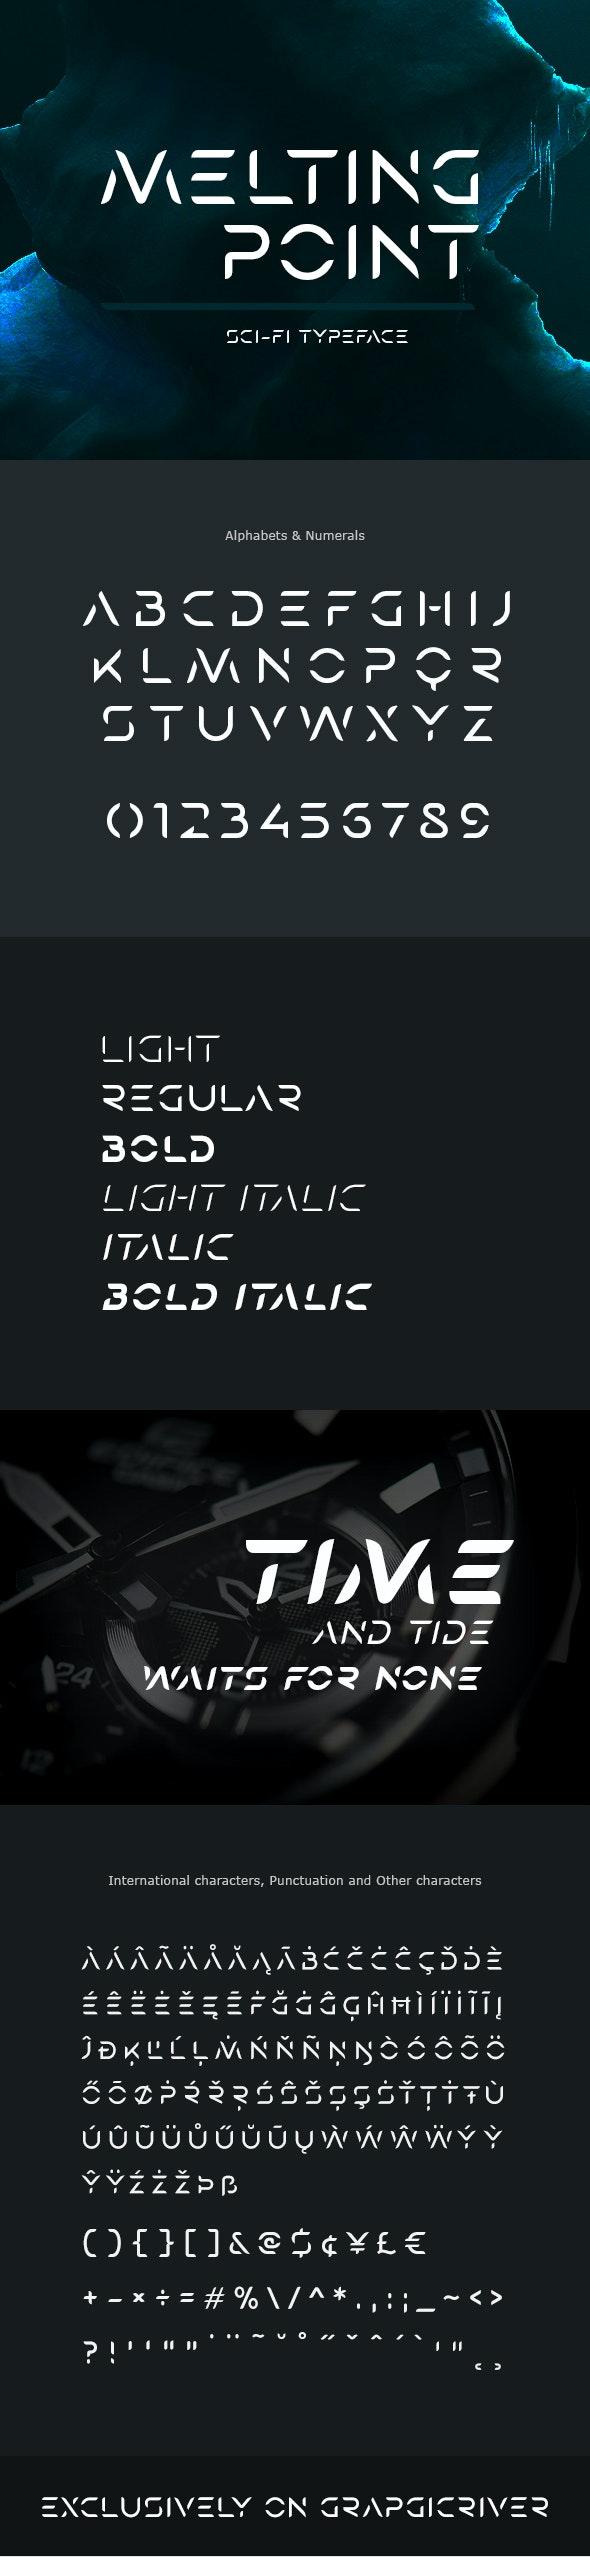 Melting Point Sci-fi Font - Futuristic Decorative